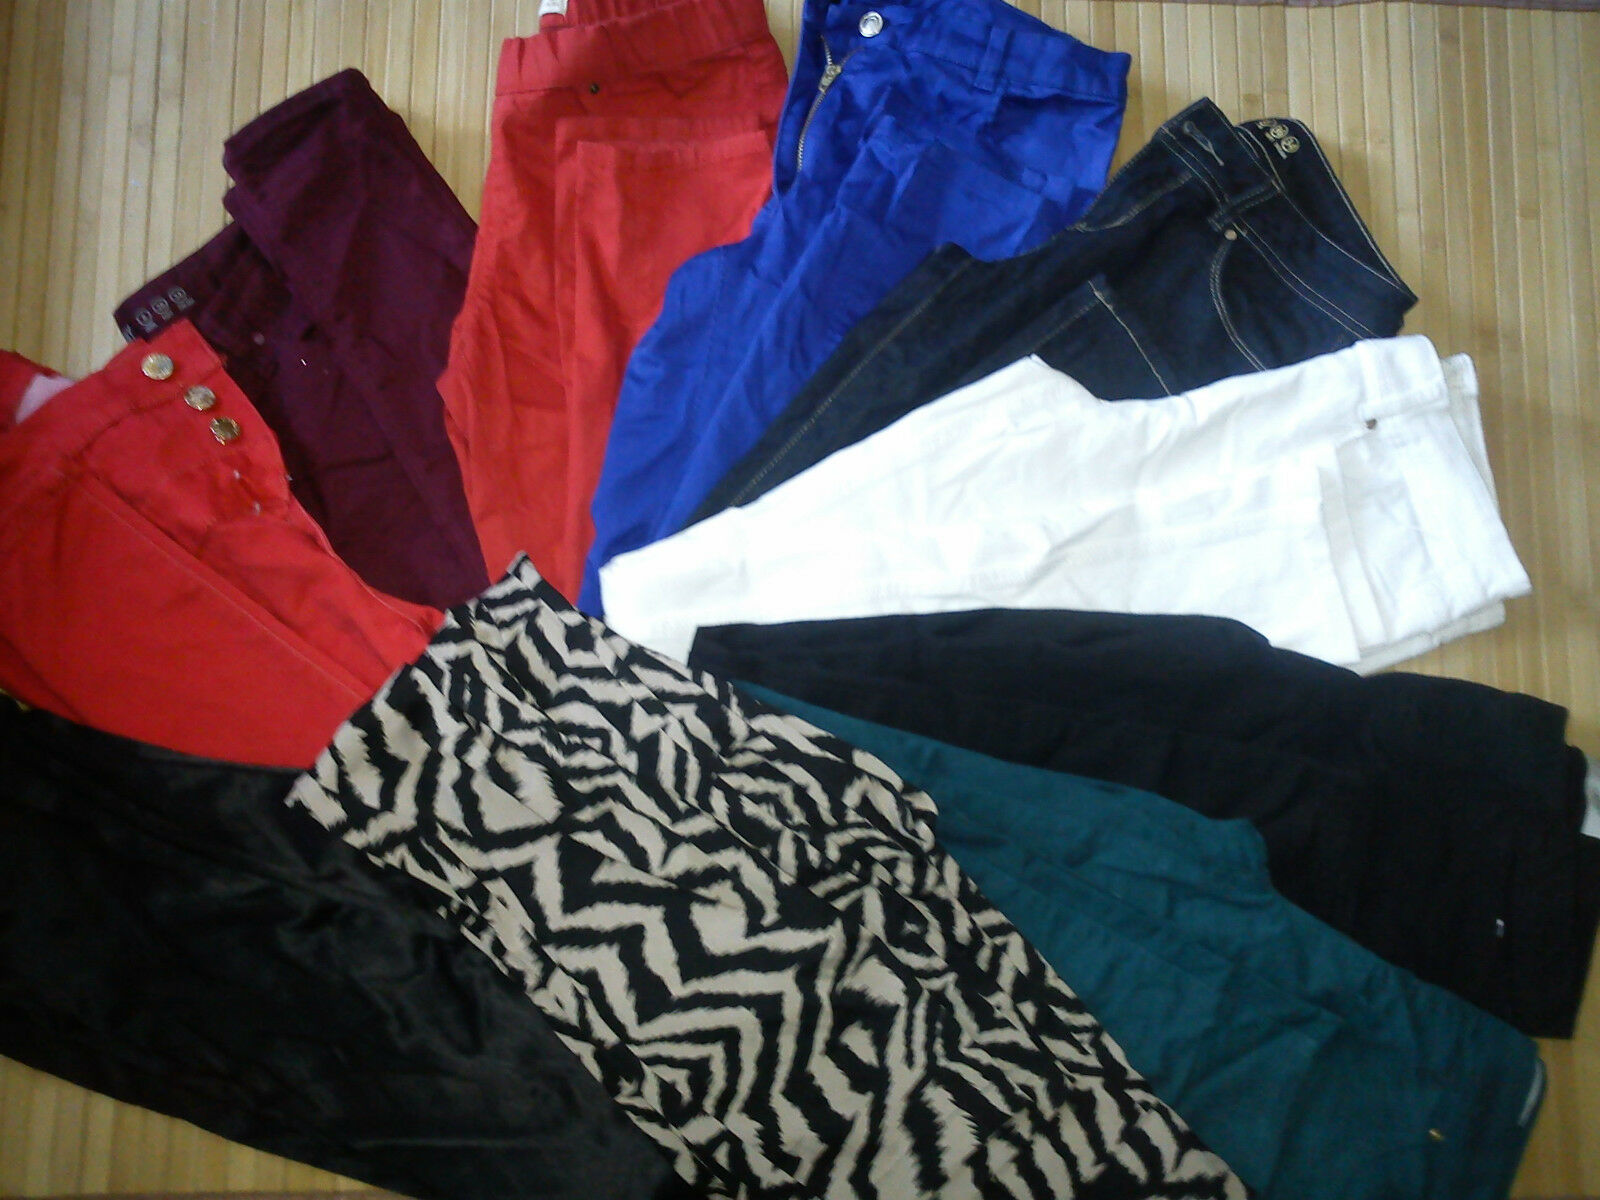 NICE USATO NUOVO 10x Bundle Donna Jeans Pantaloni Attillati Taglia 8 (3)